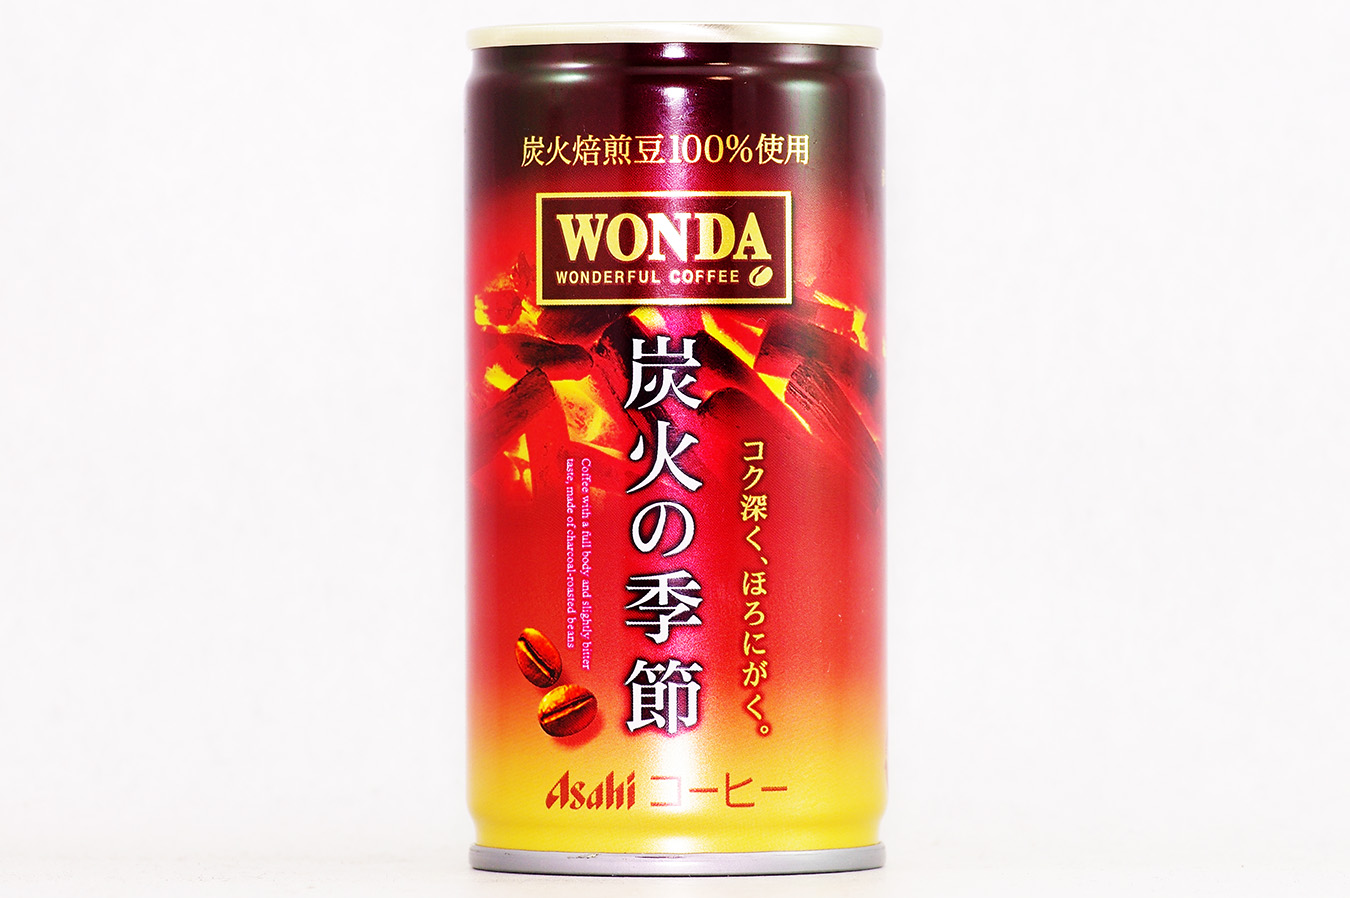 WONDA 炭火の季節